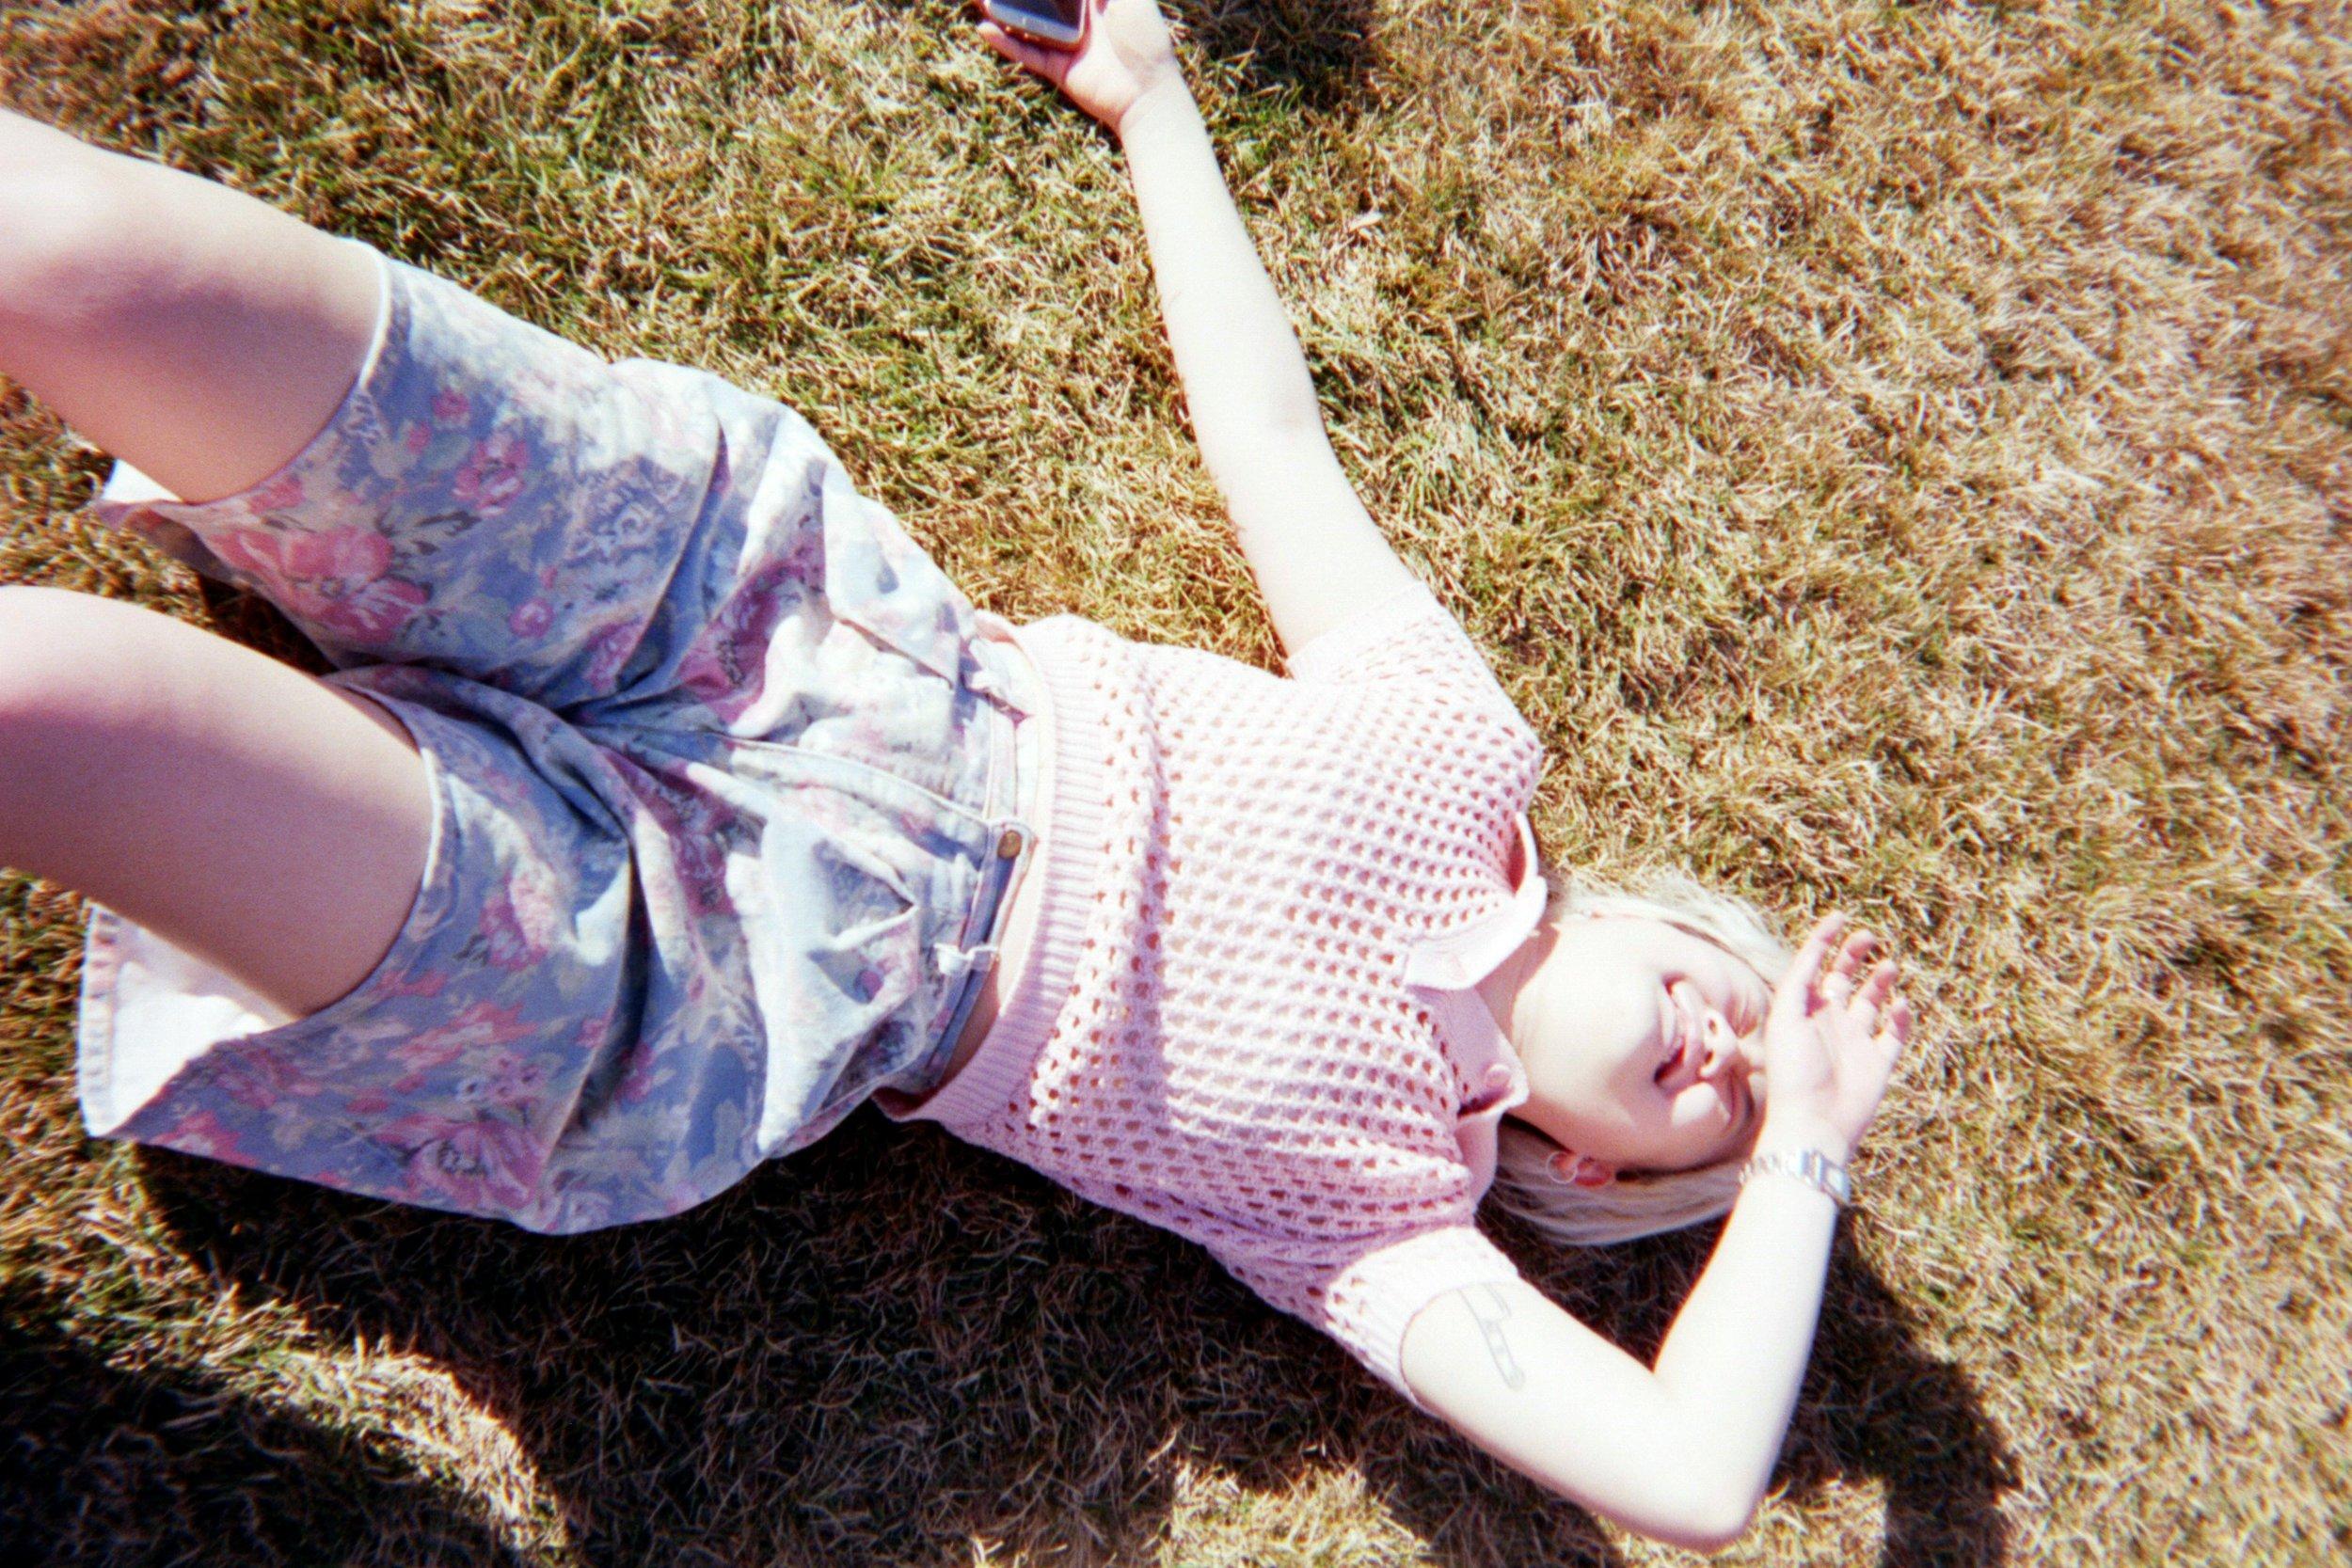 nancy on the lawn - CU - spring17.jpg